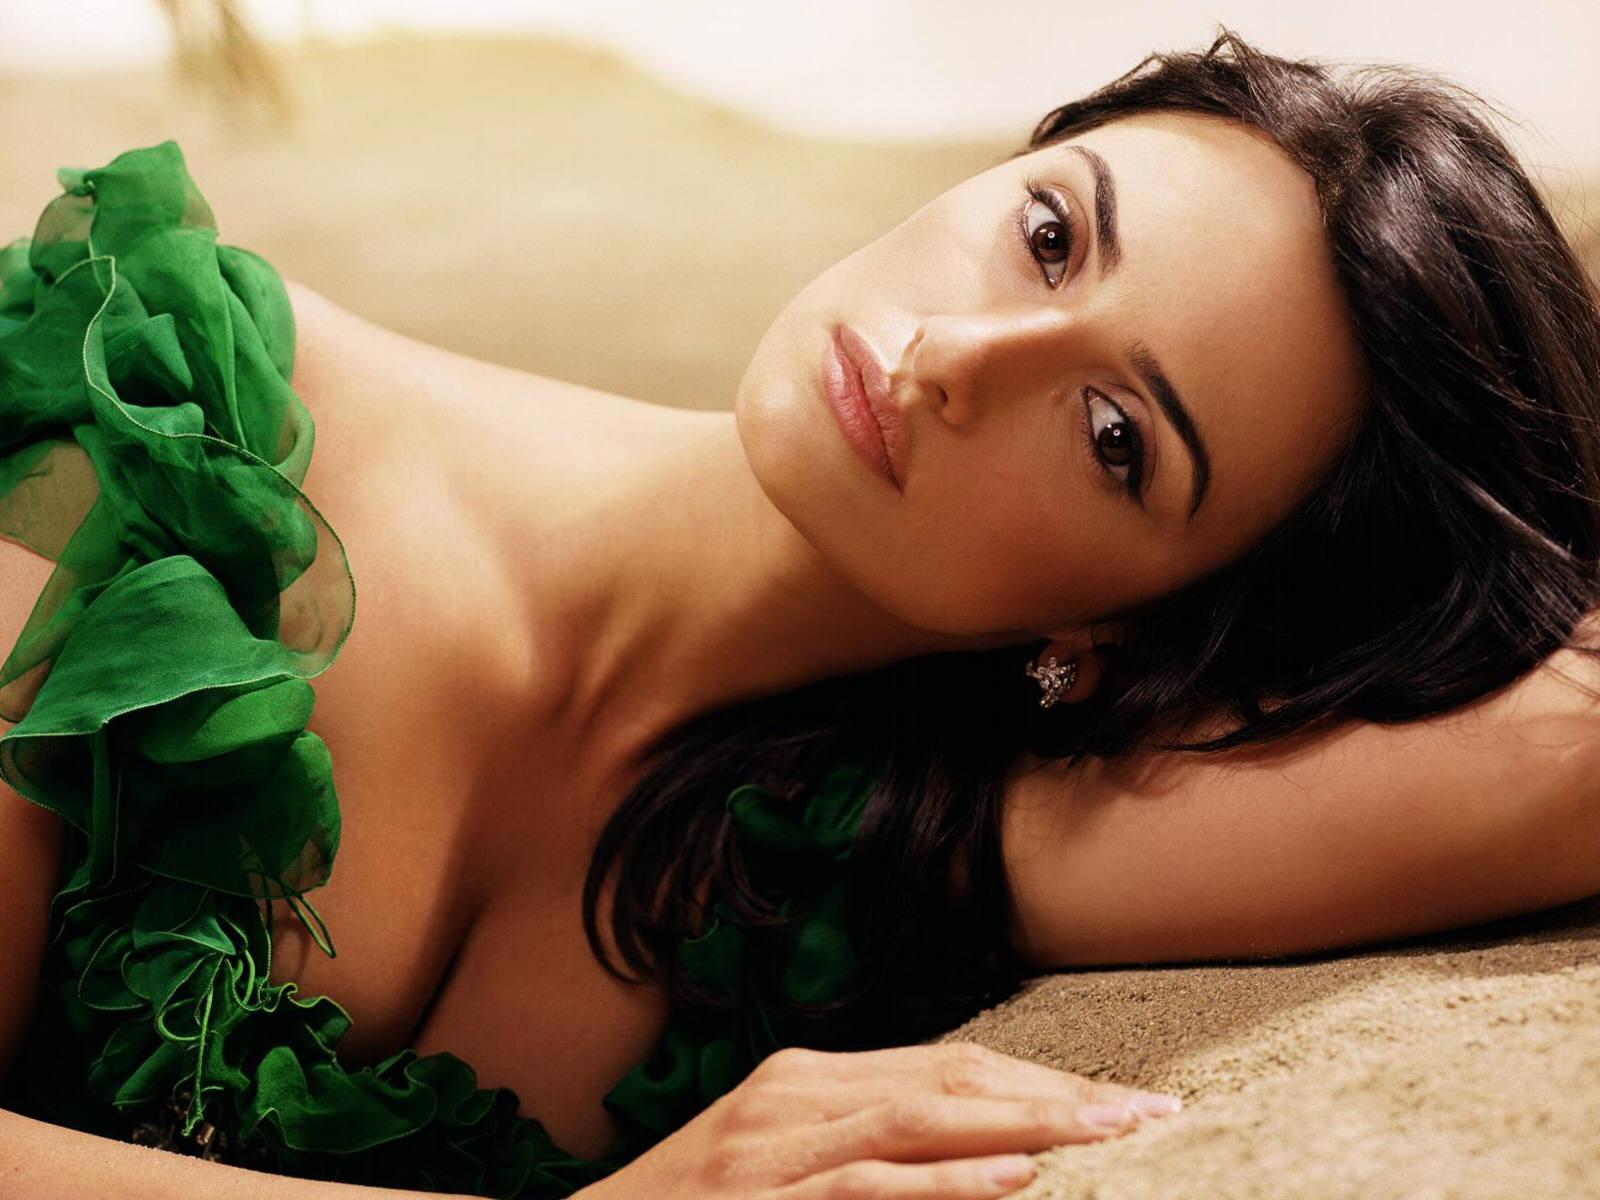 http://3.bp.blogspot.com/-0qtFrIv6qN0/T4lI7sEvb4I/AAAAAAAAHFc/rkq3EvKR2d4/s1600/Penelope_Cruz_-_Spanish_actress.jpg